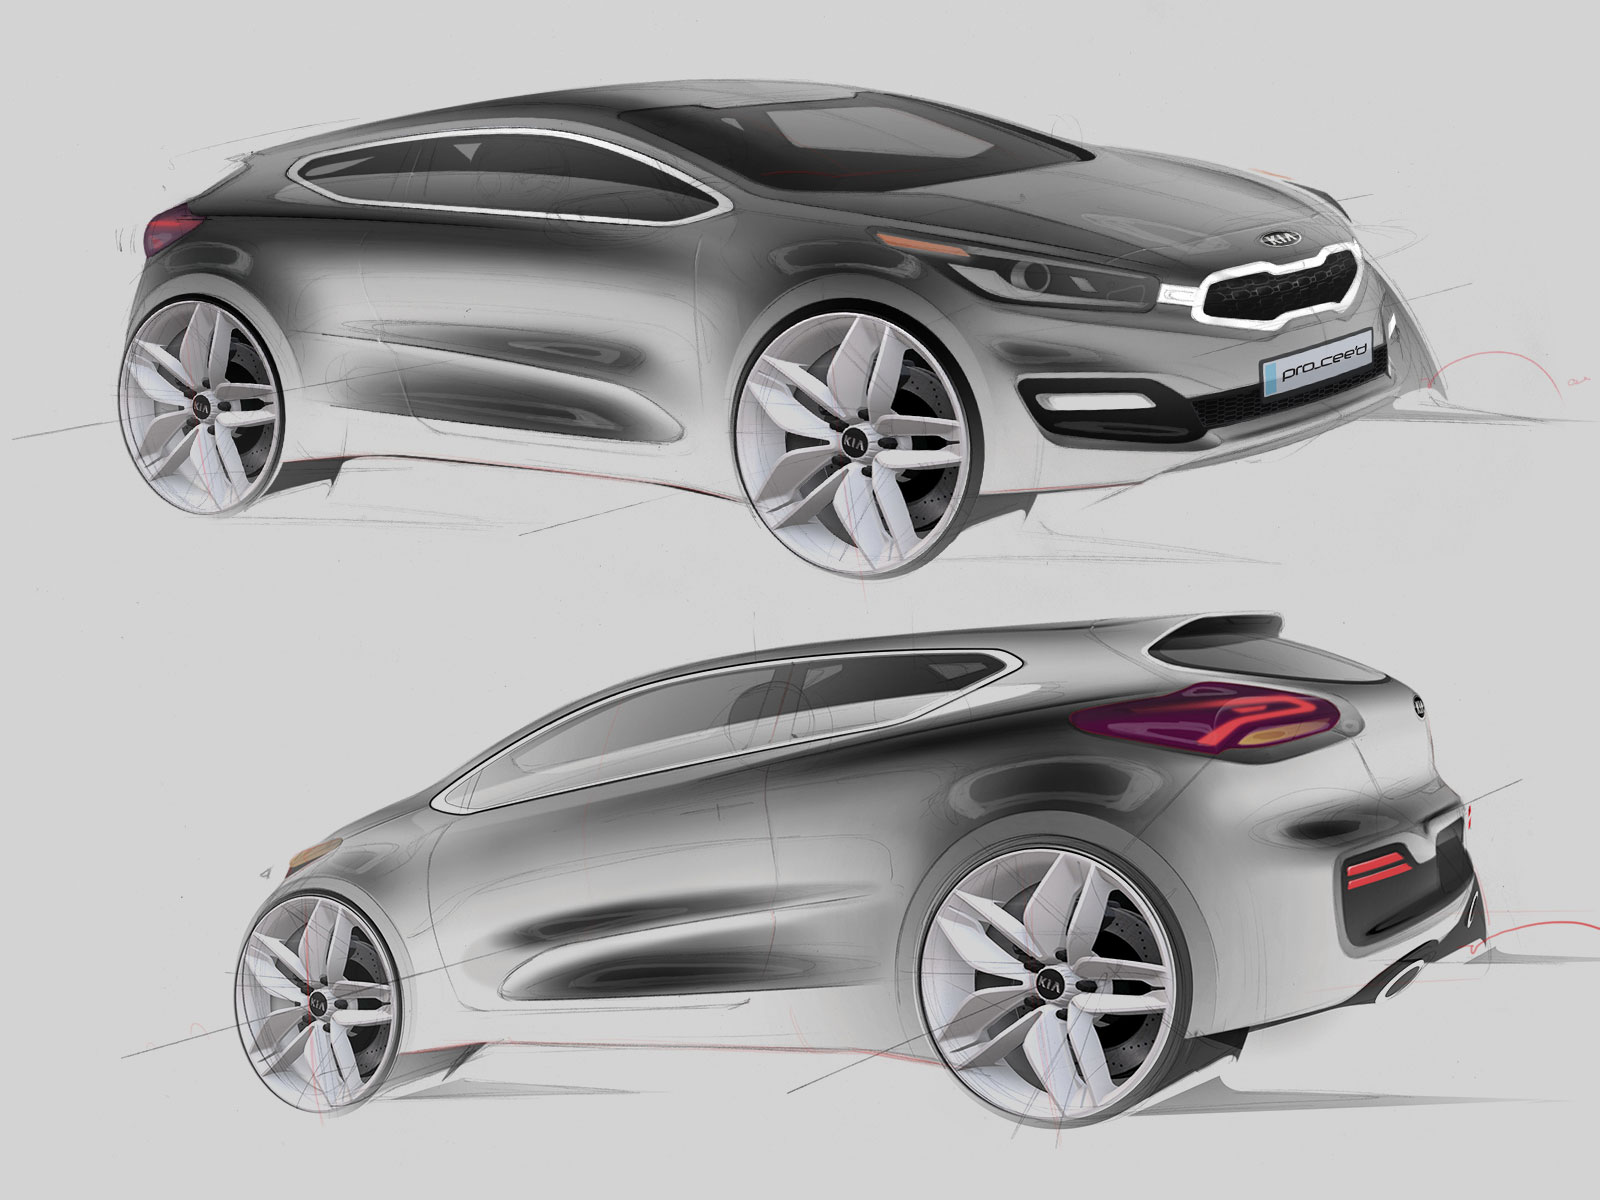 2012 kia pro cee 39 d design sketches car body design. Black Bedroom Furniture Sets. Home Design Ideas